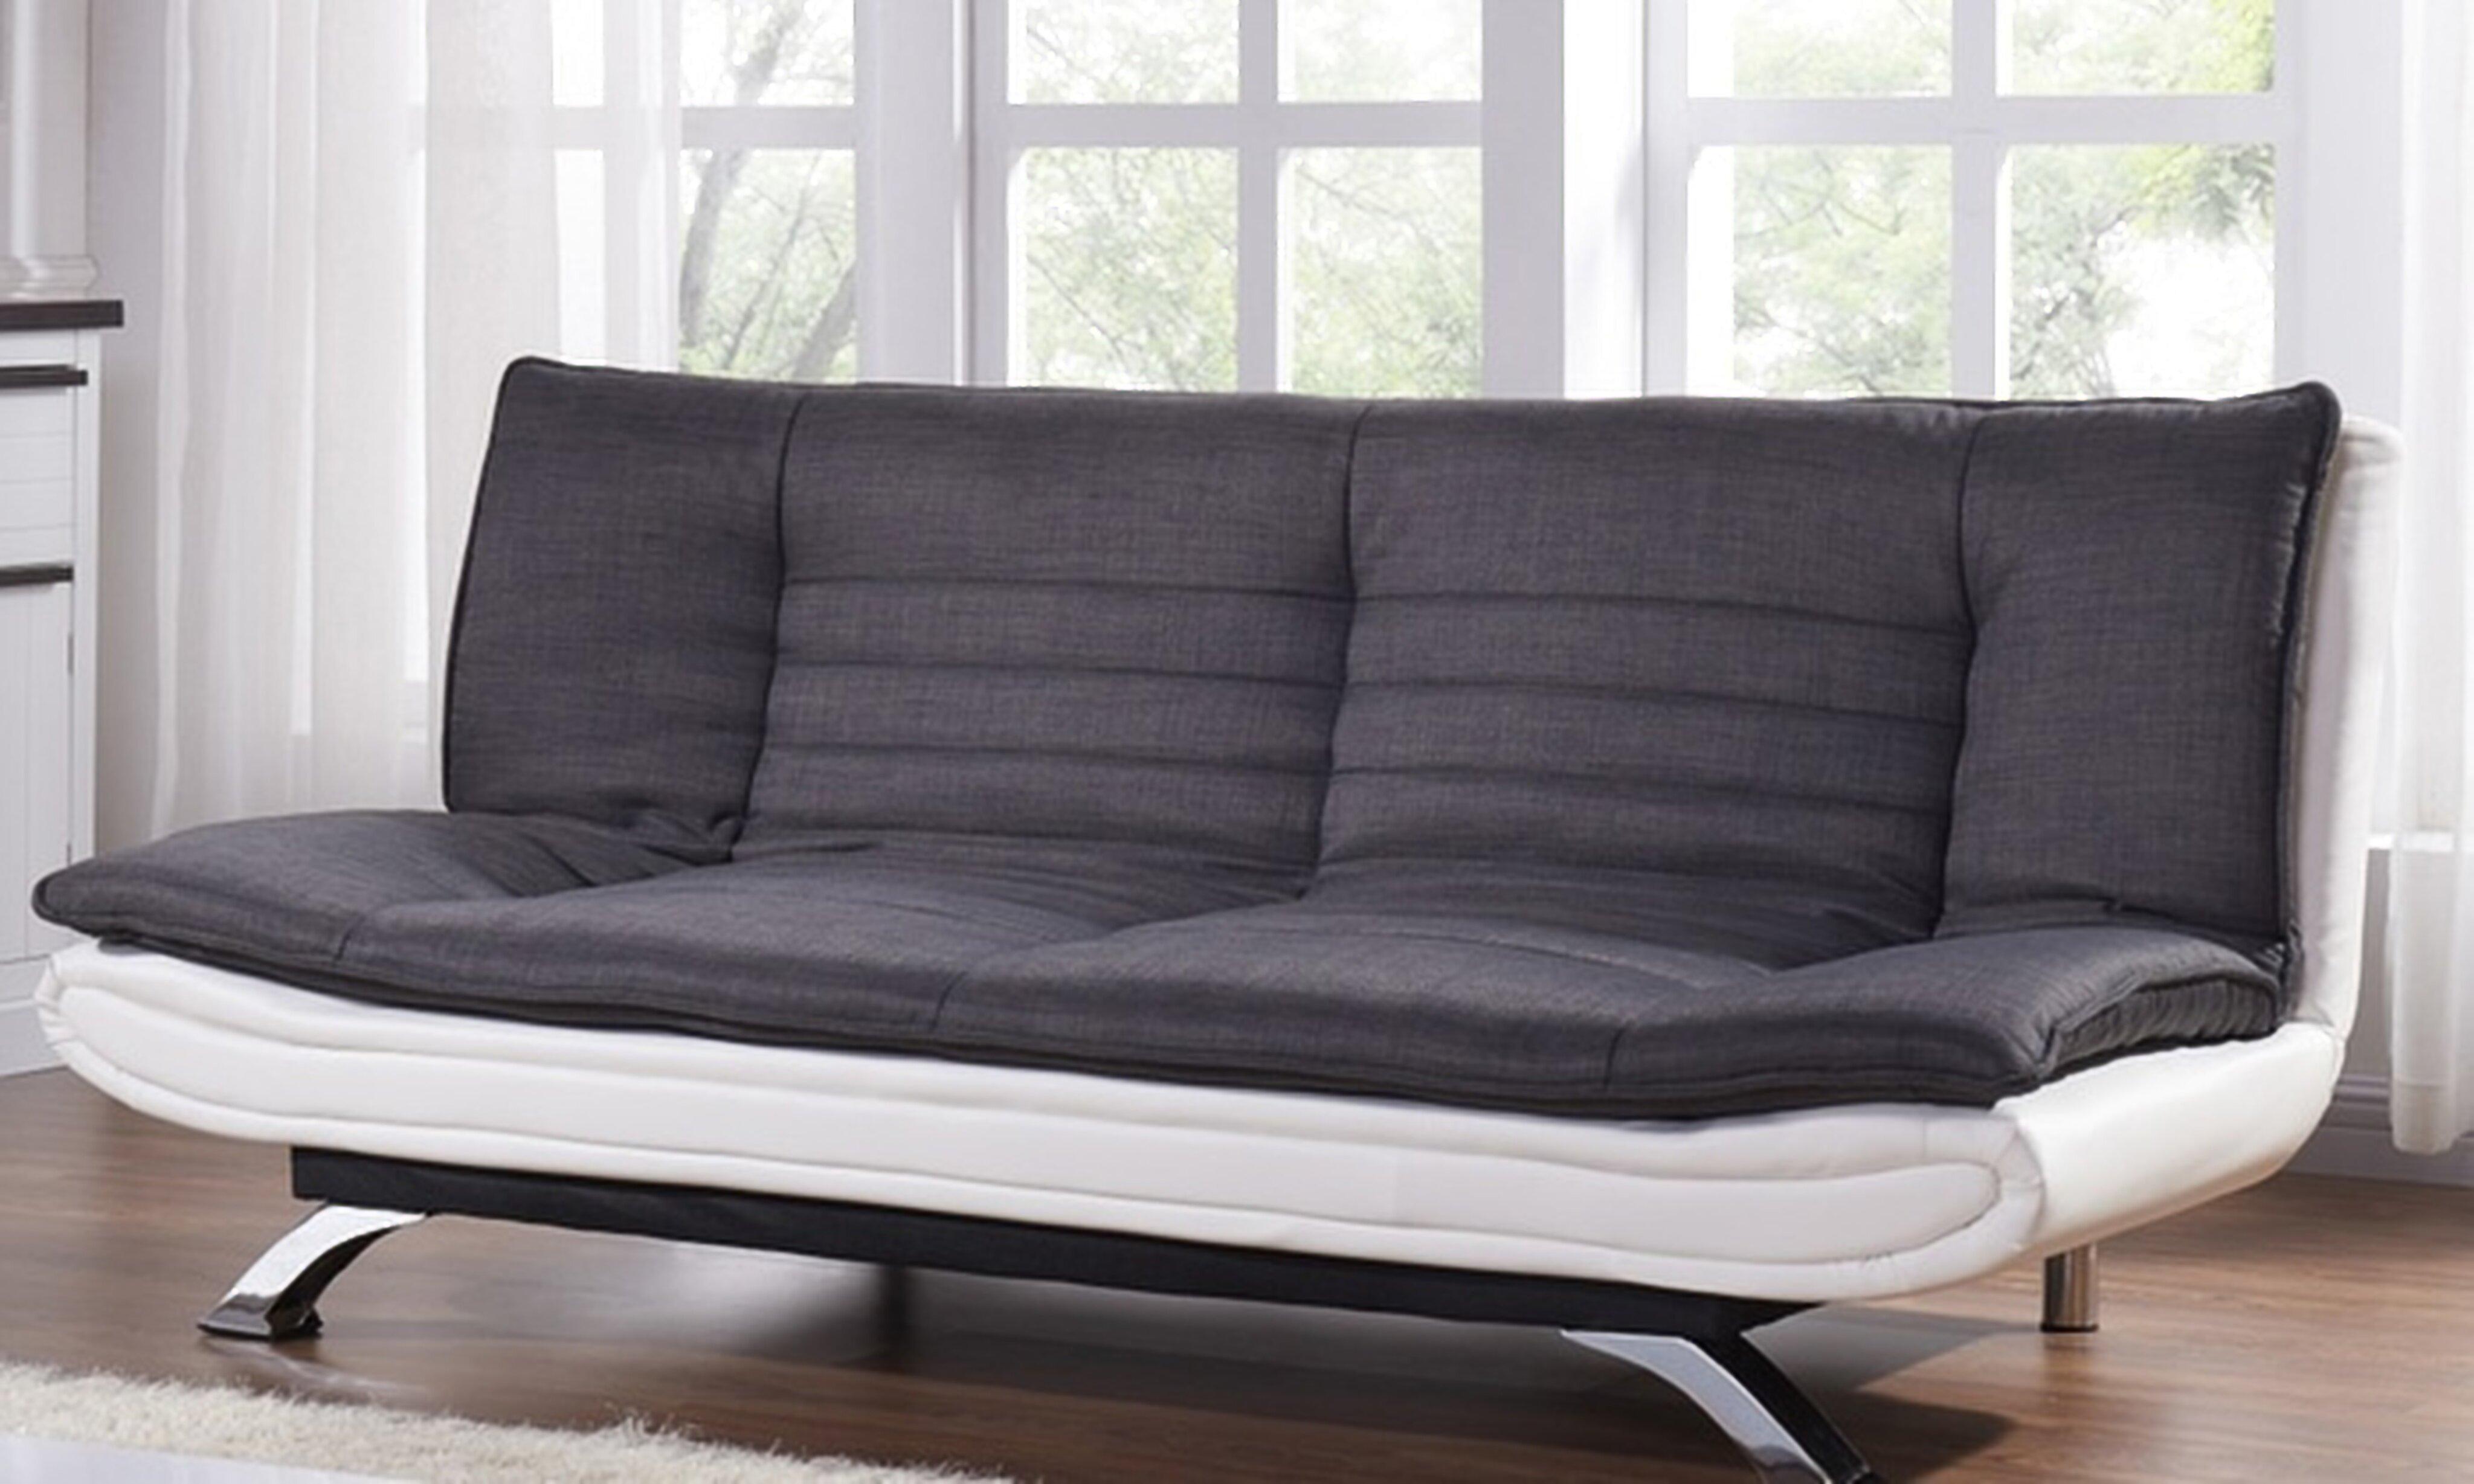 Damiano 3 Seater Clic Clac Sofa Bed